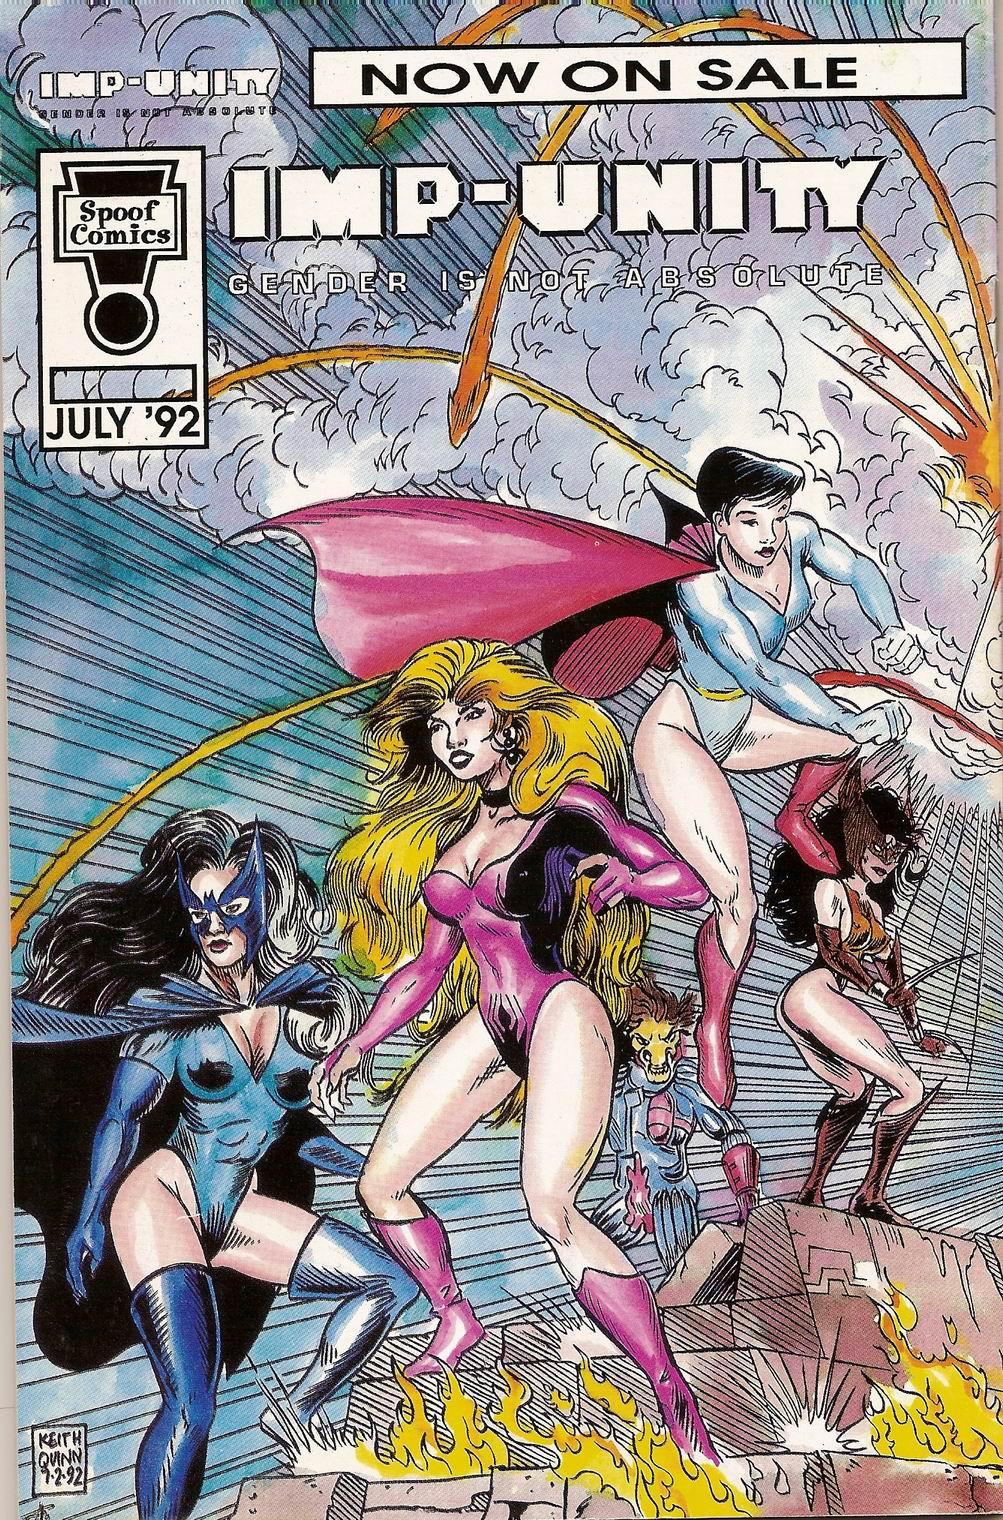 Spoof Comics 5 Page 25